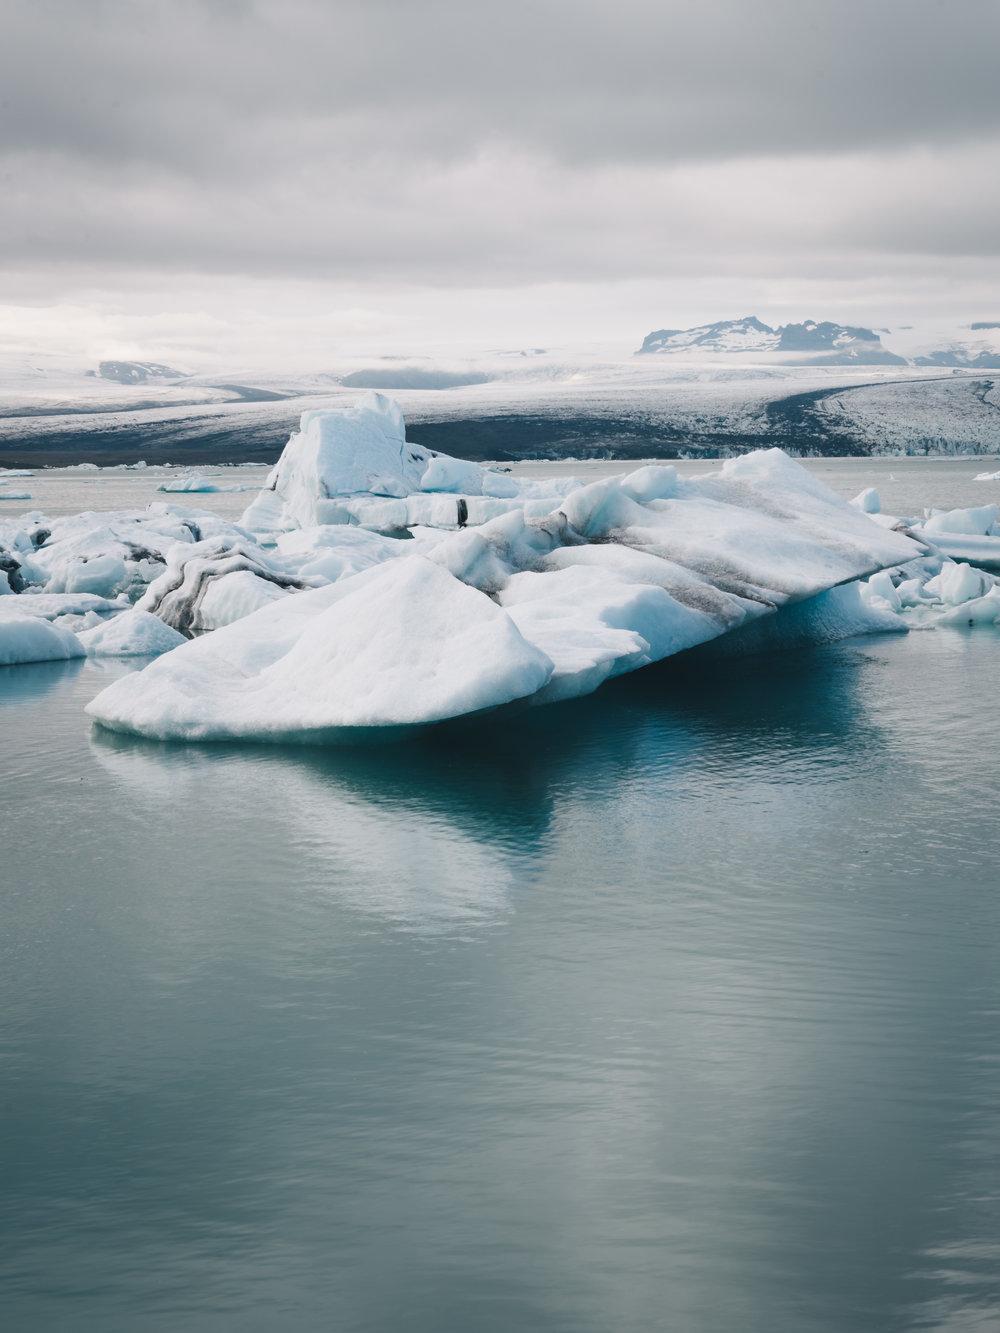 Jokularson Glacial Lagoon  |7.23.16| Iceland